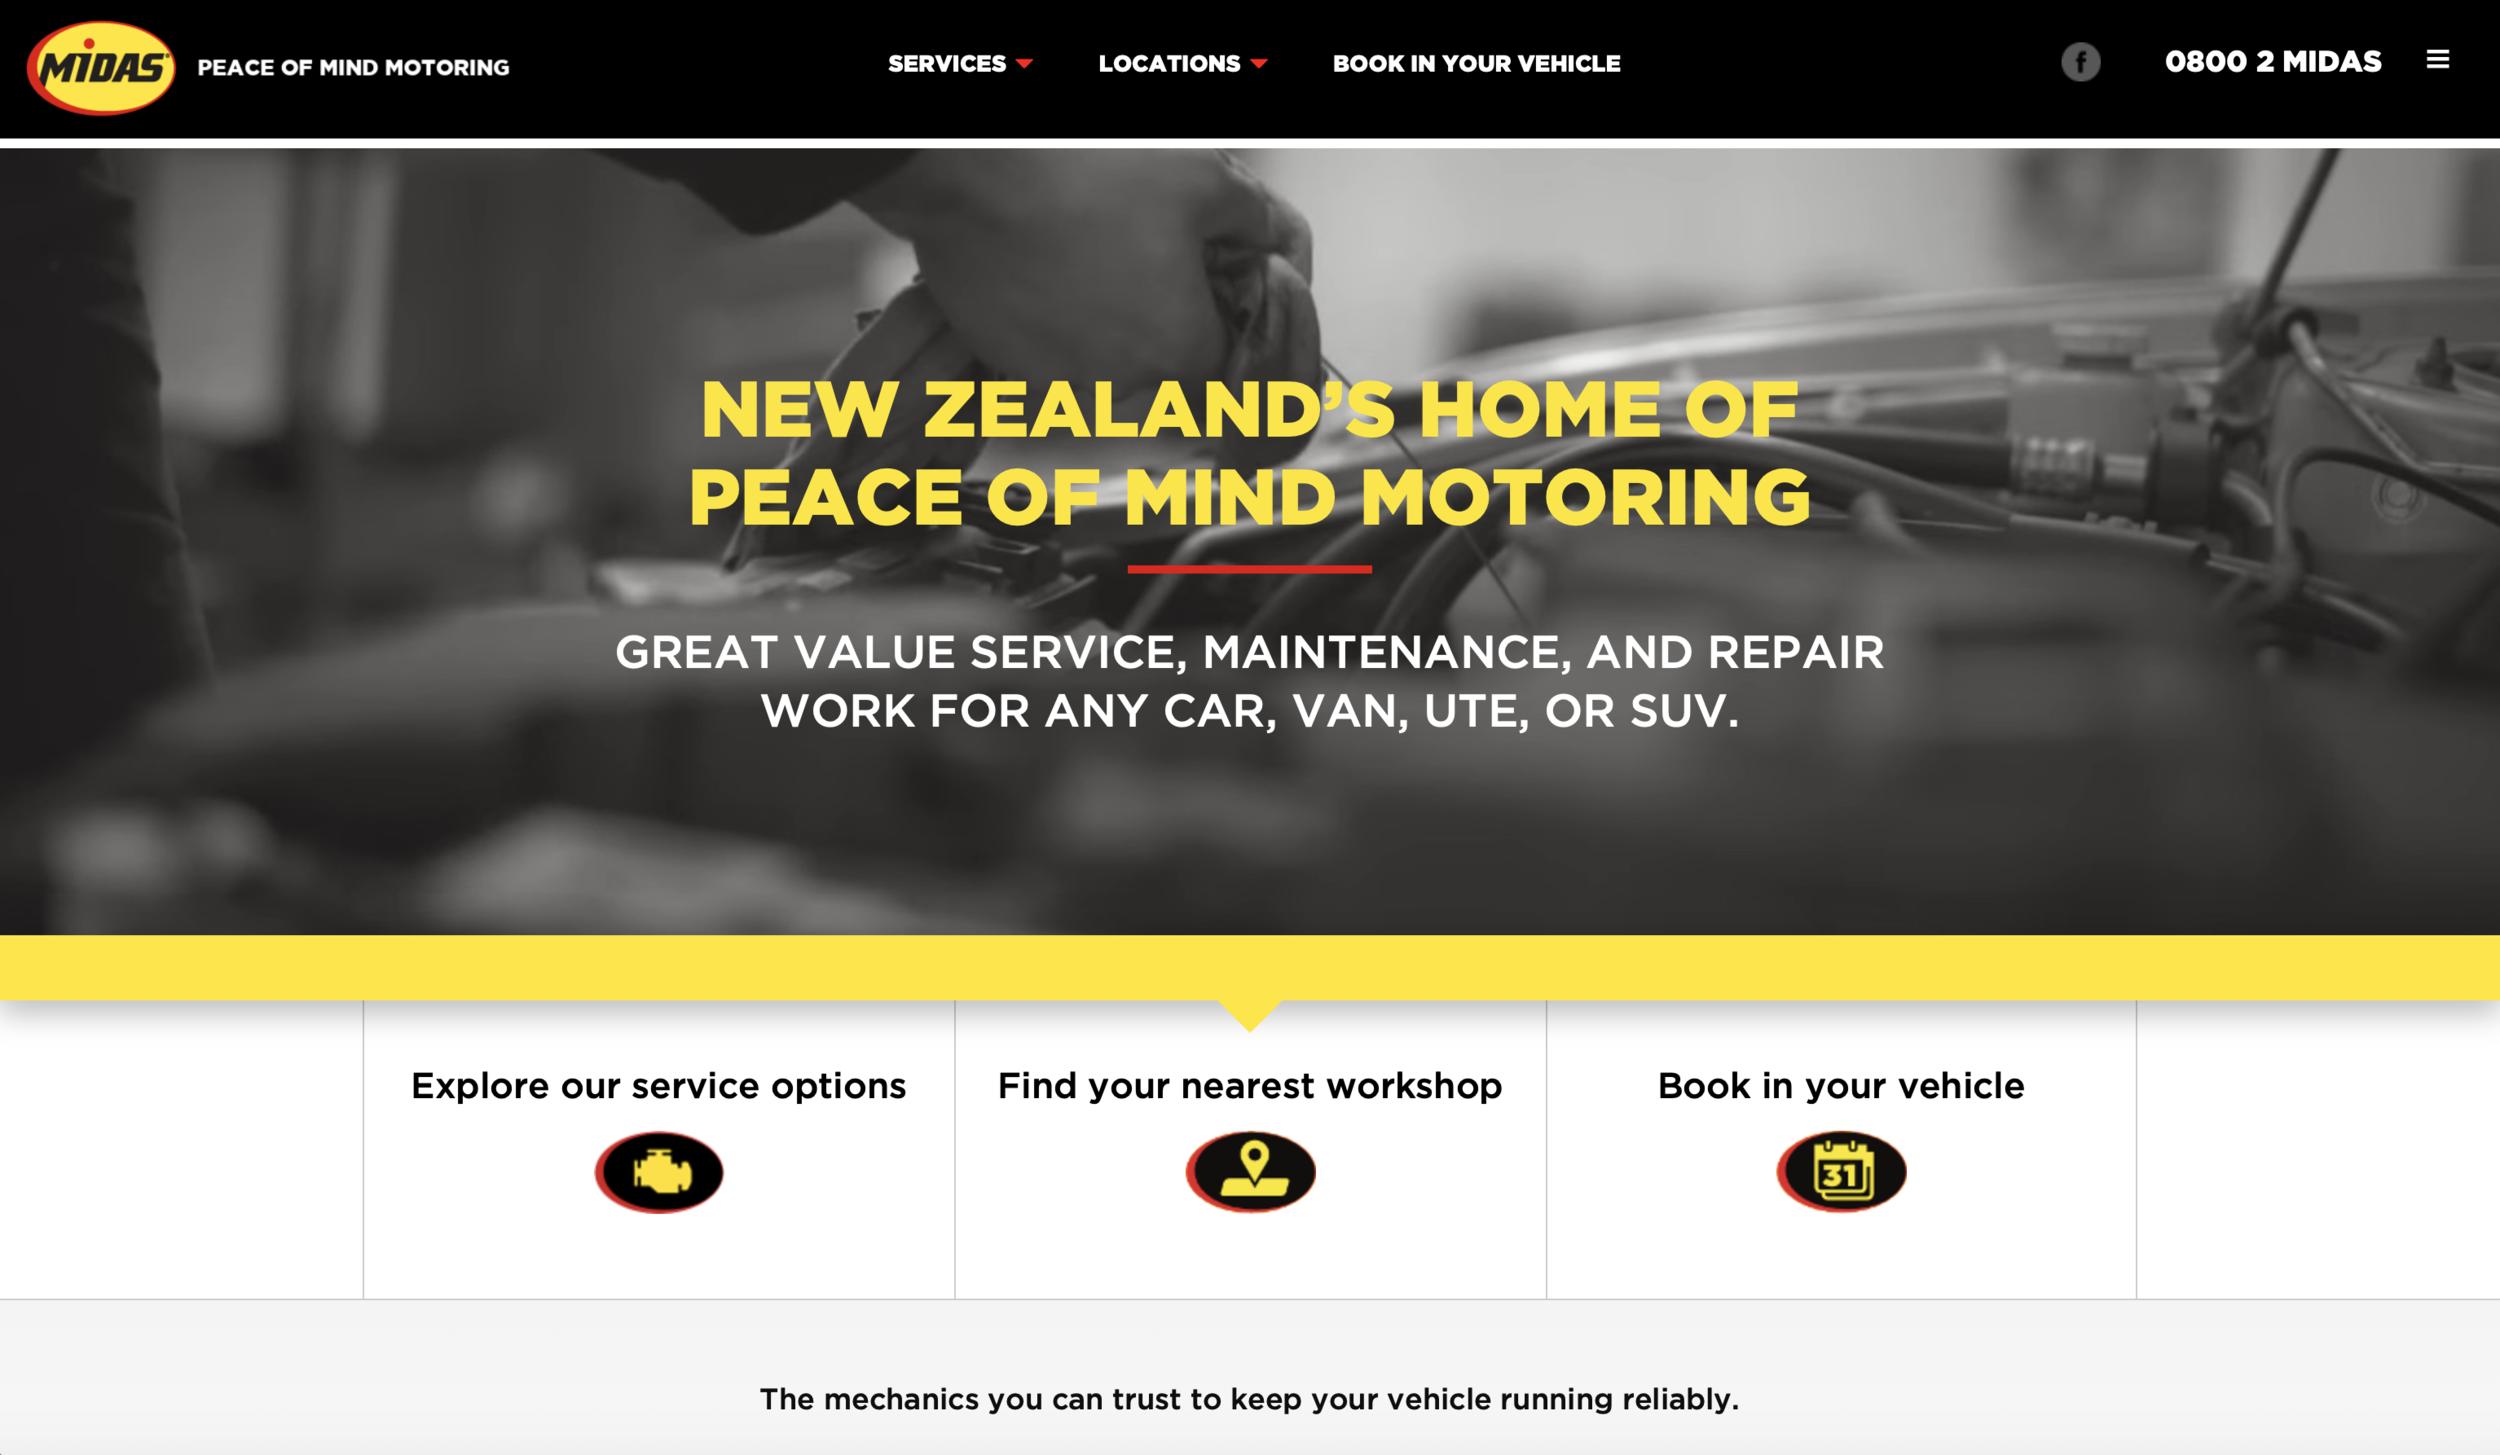 Midas NZ Website Home Page